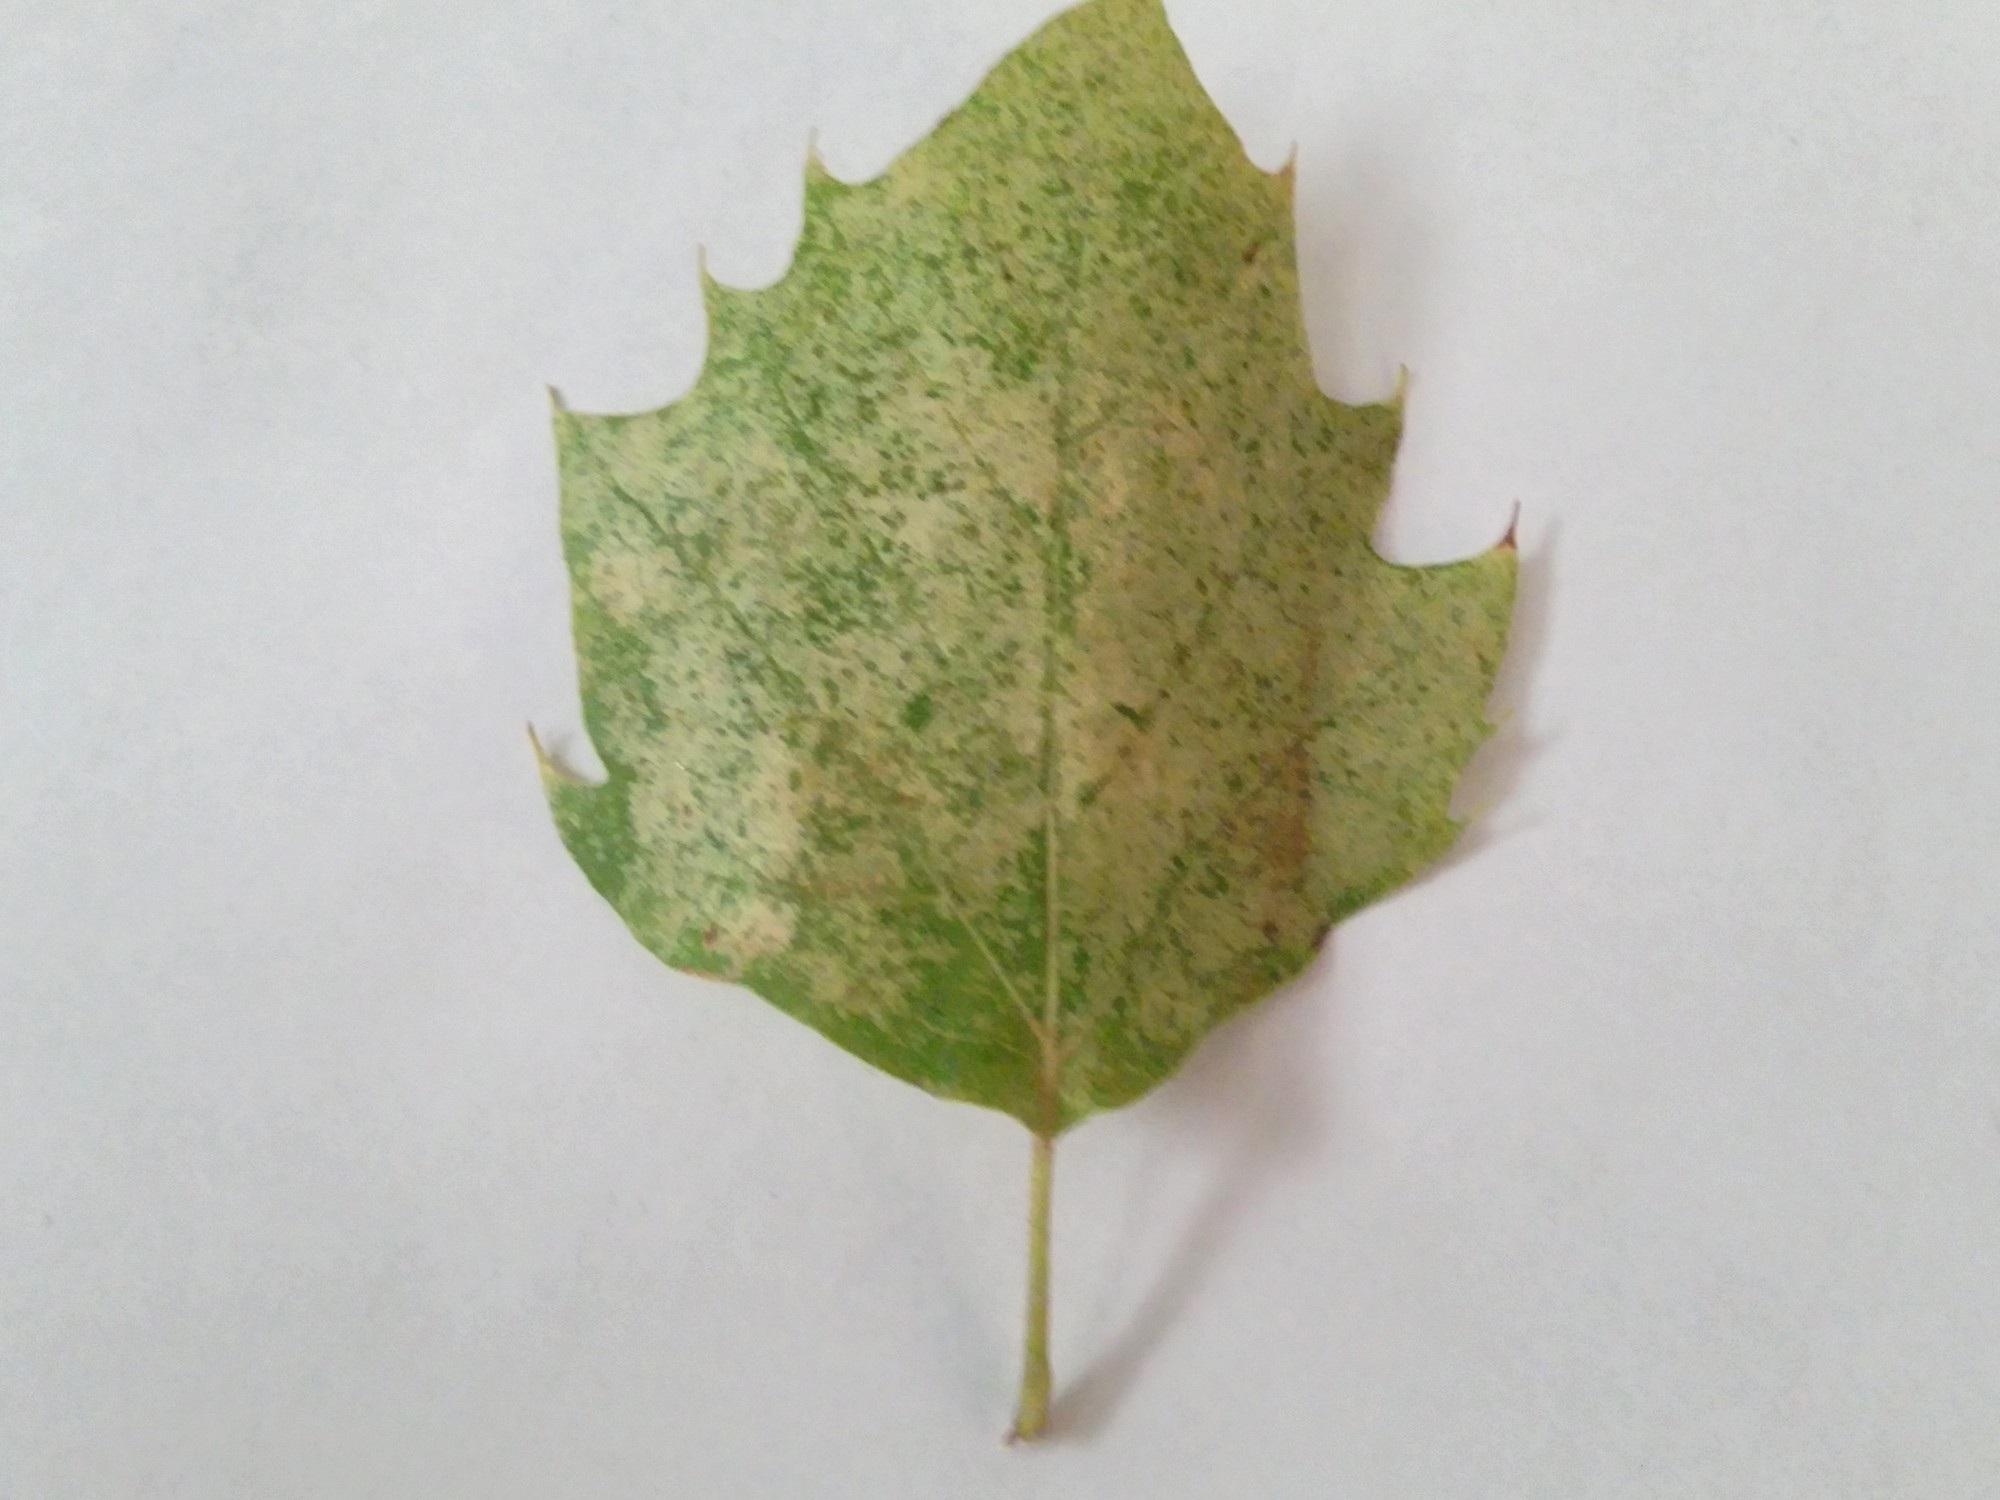 infected+leaf.jpg